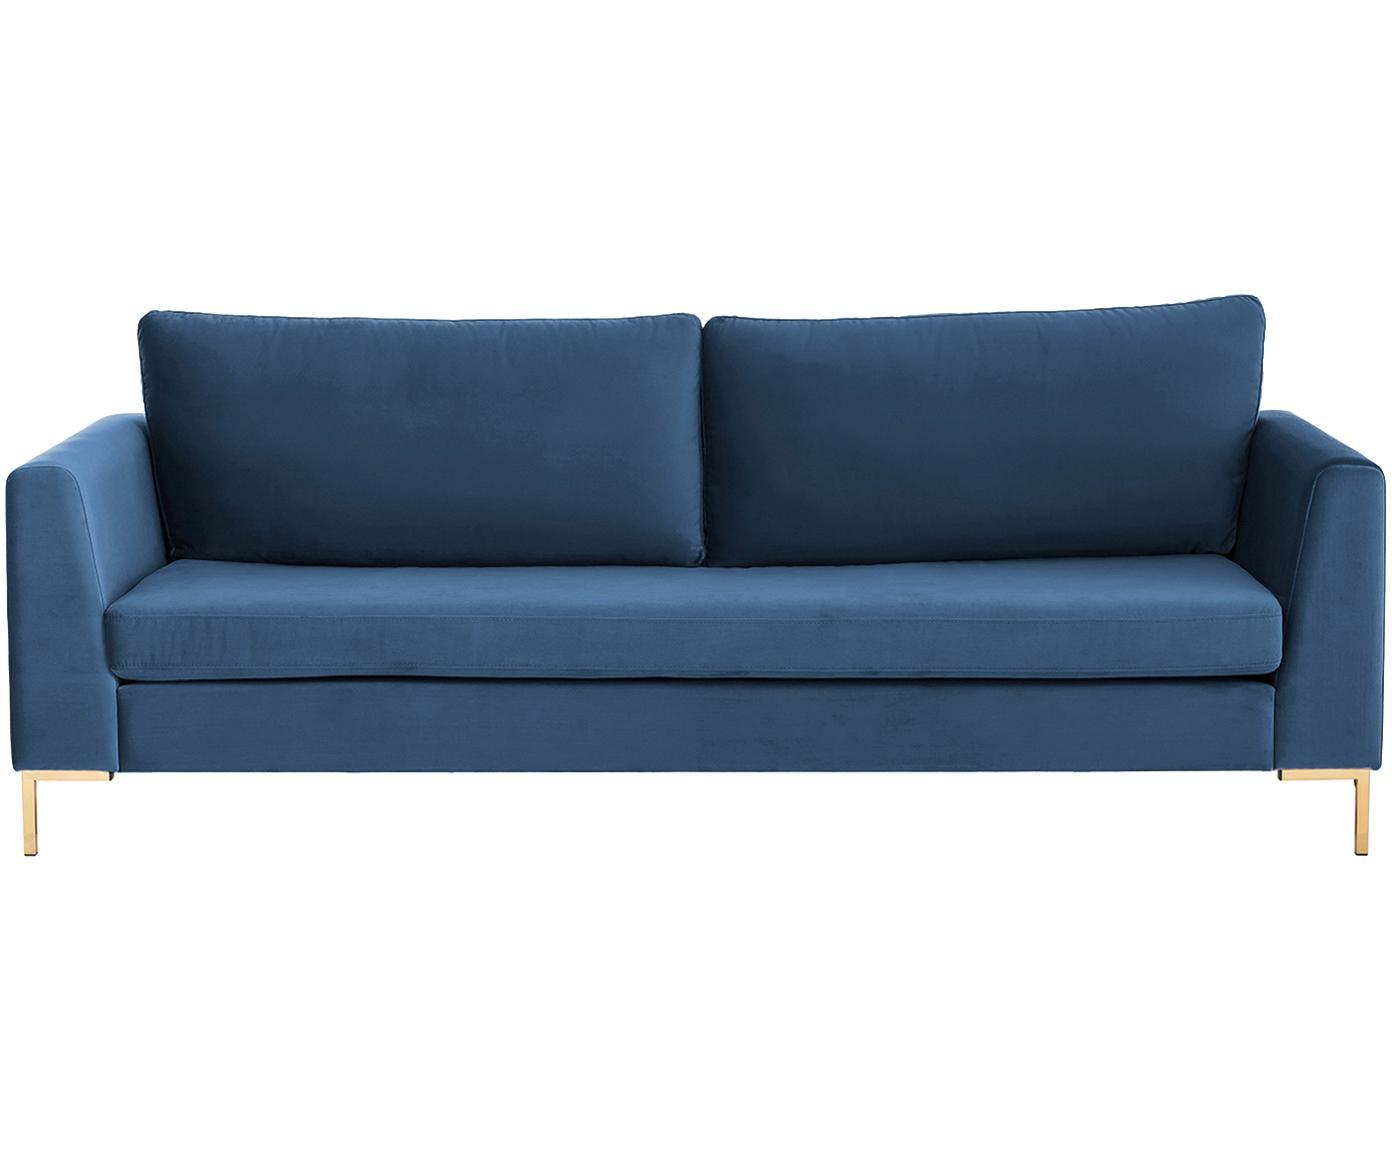 Samt-Sofa Luna (3-Sitzer), Bezug: Samt (Polyester) 80.000 S, Gestell: Massives Buchenholz, Samt Blau, Gold, B 230 x T 95 cm